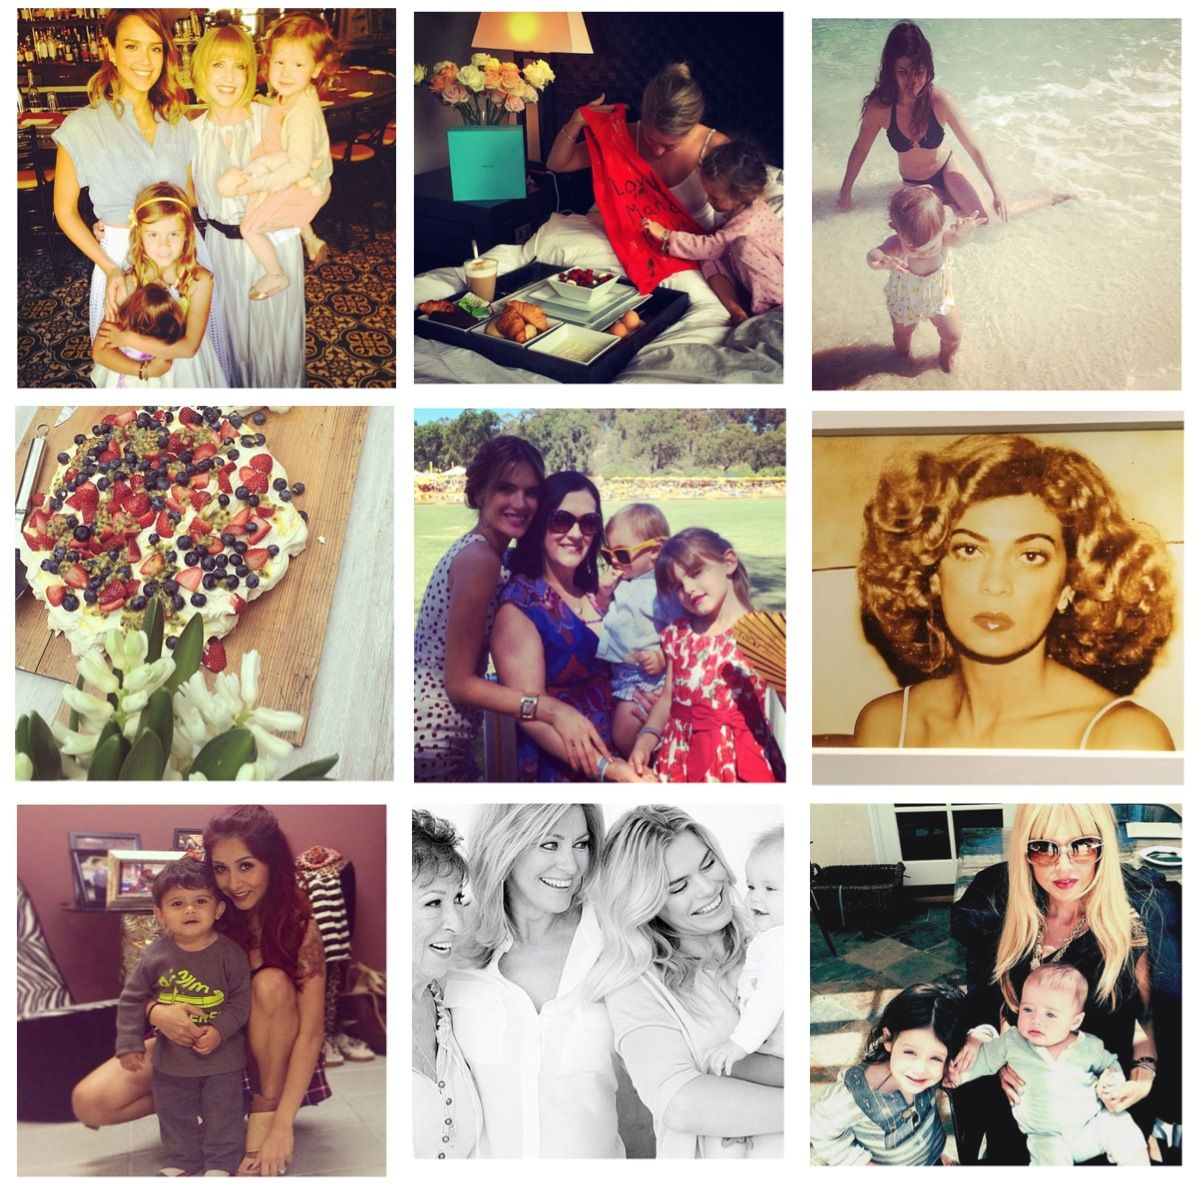 Celebrity moms Celebrating Mother's day! A lot of celebrity mommy daughter moments on Instagram #Mothersday @ http://www.pretamama.com/celebs/6723-celebrity-moms-celebrating-mothers-day